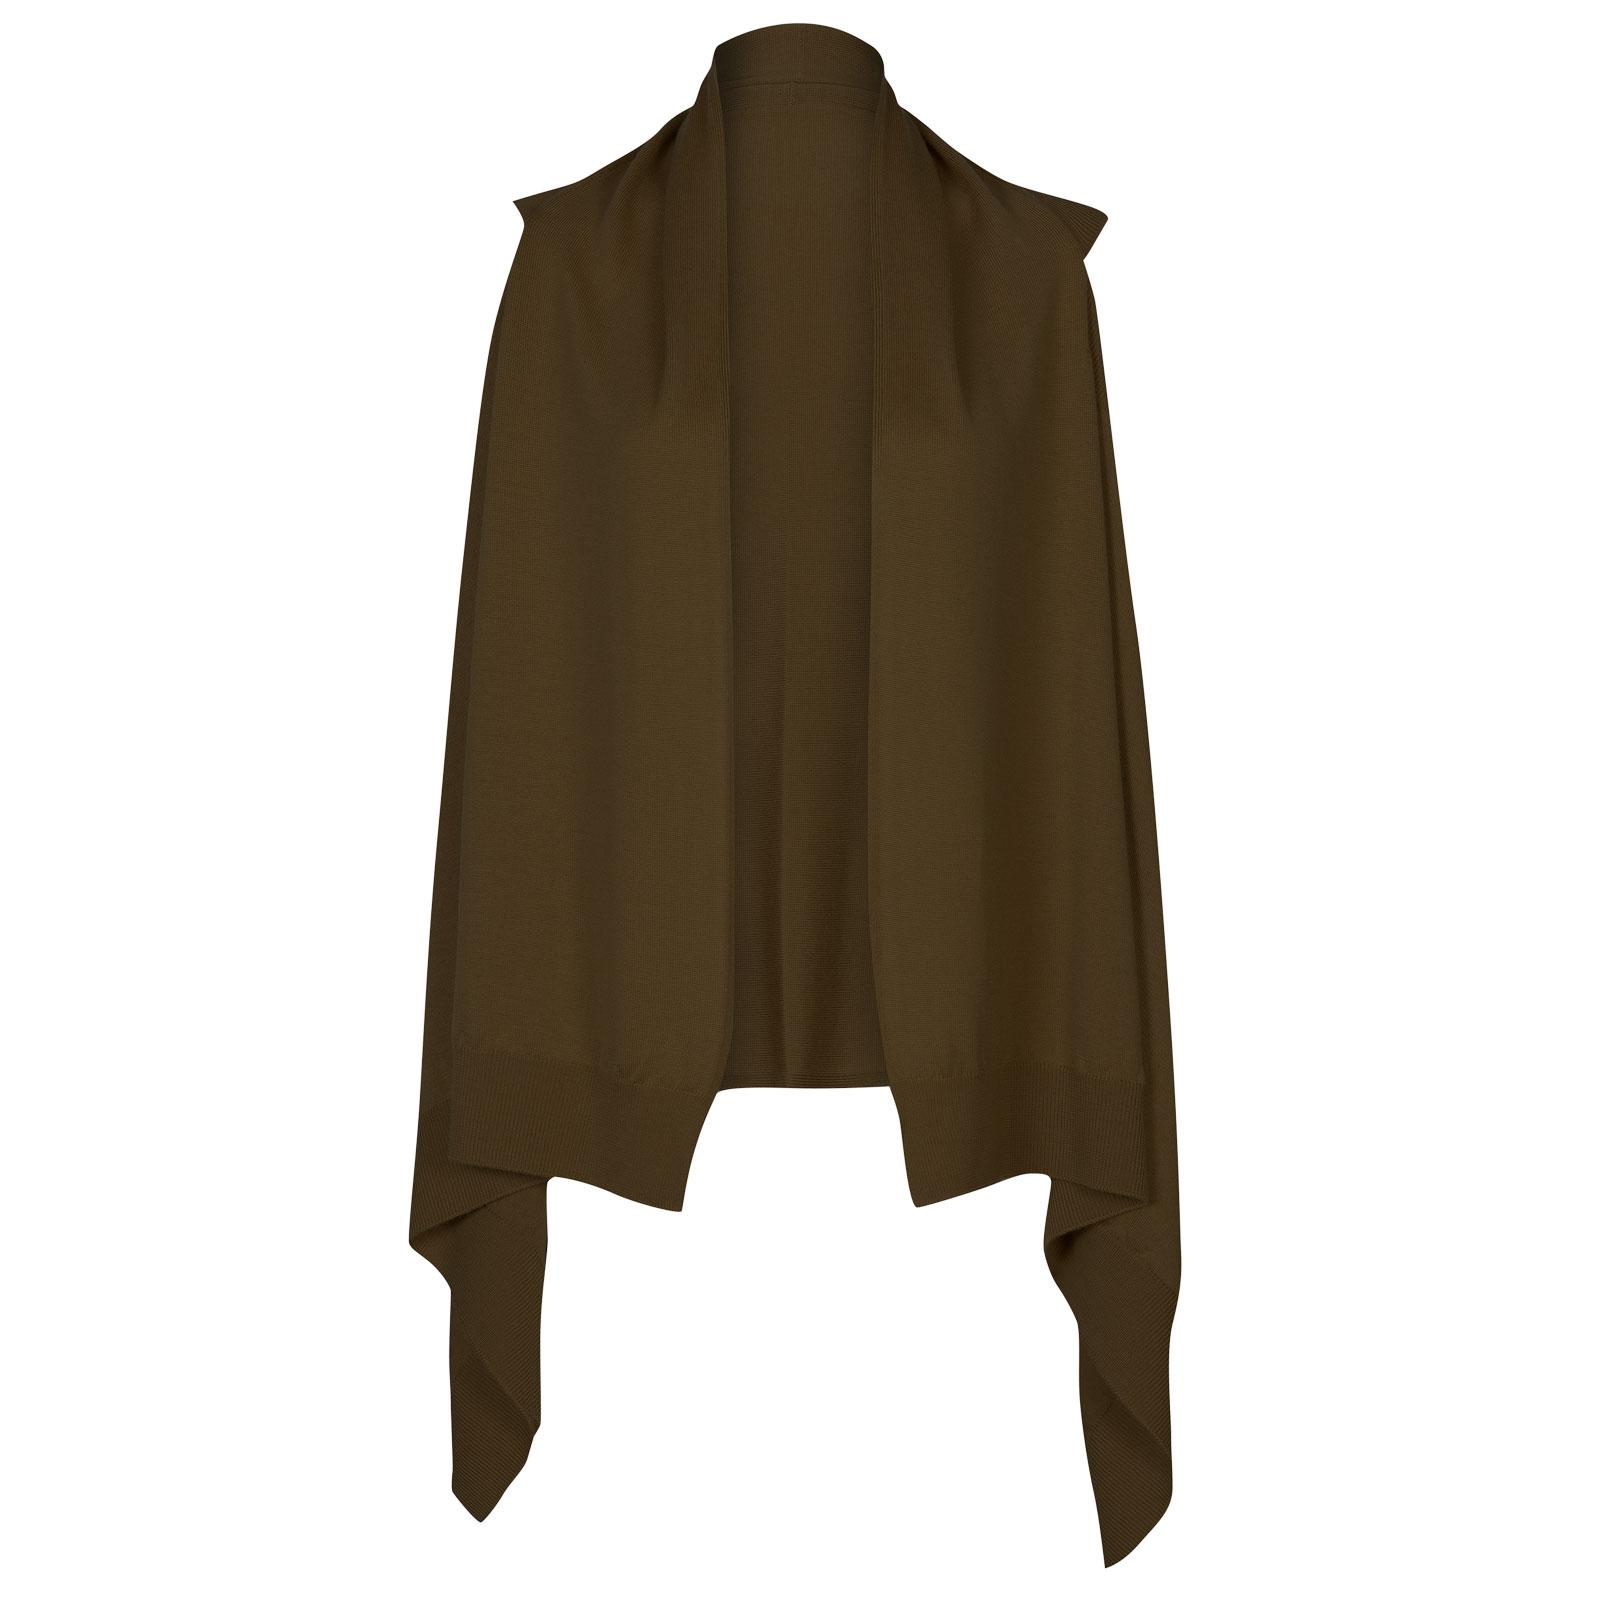 John Smedley talla Merino Wool Cardigan in Kielder Green-M